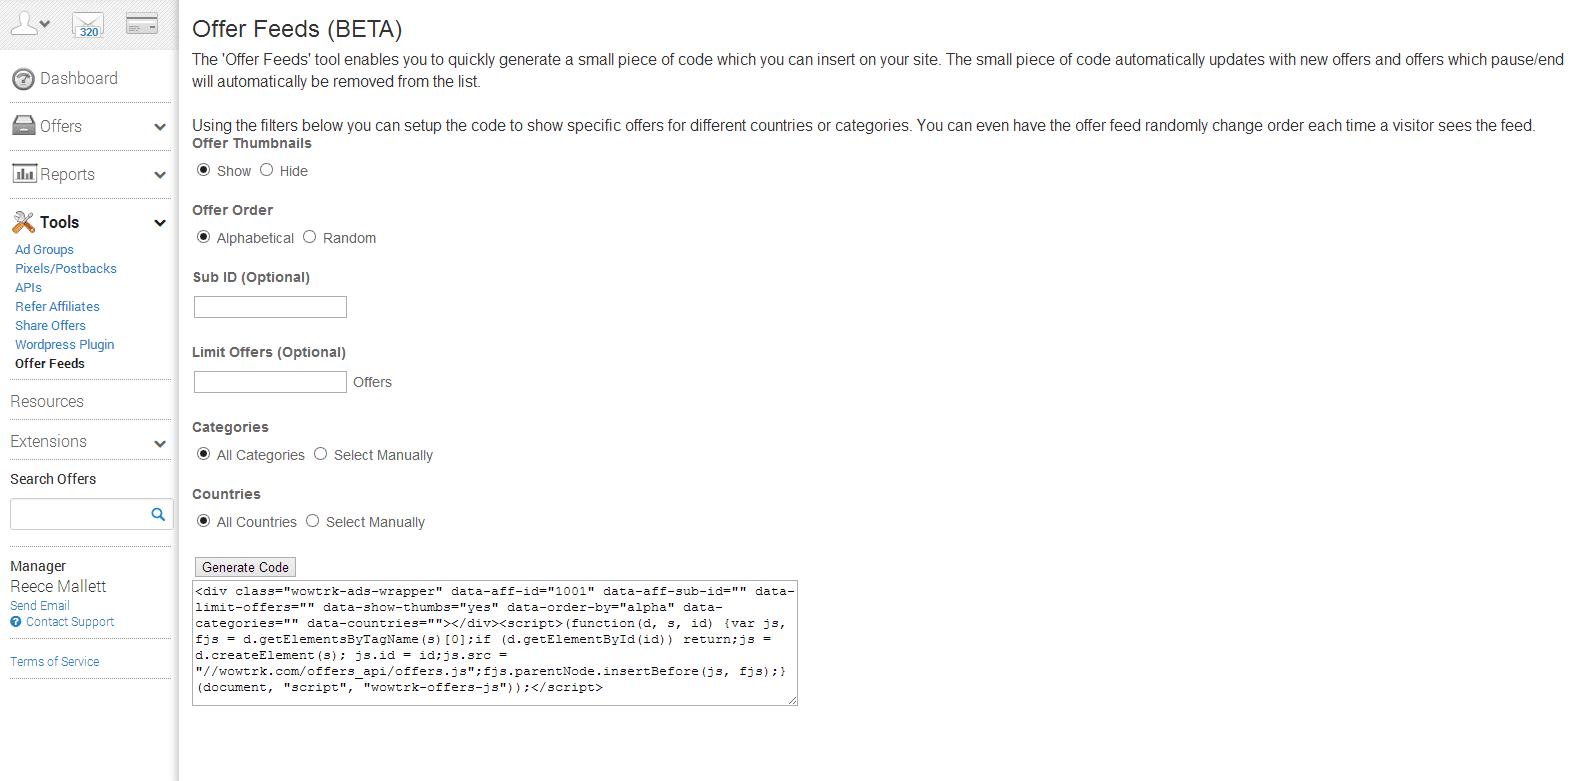 Screenshot of the WOW TRK Offer Feeds tool